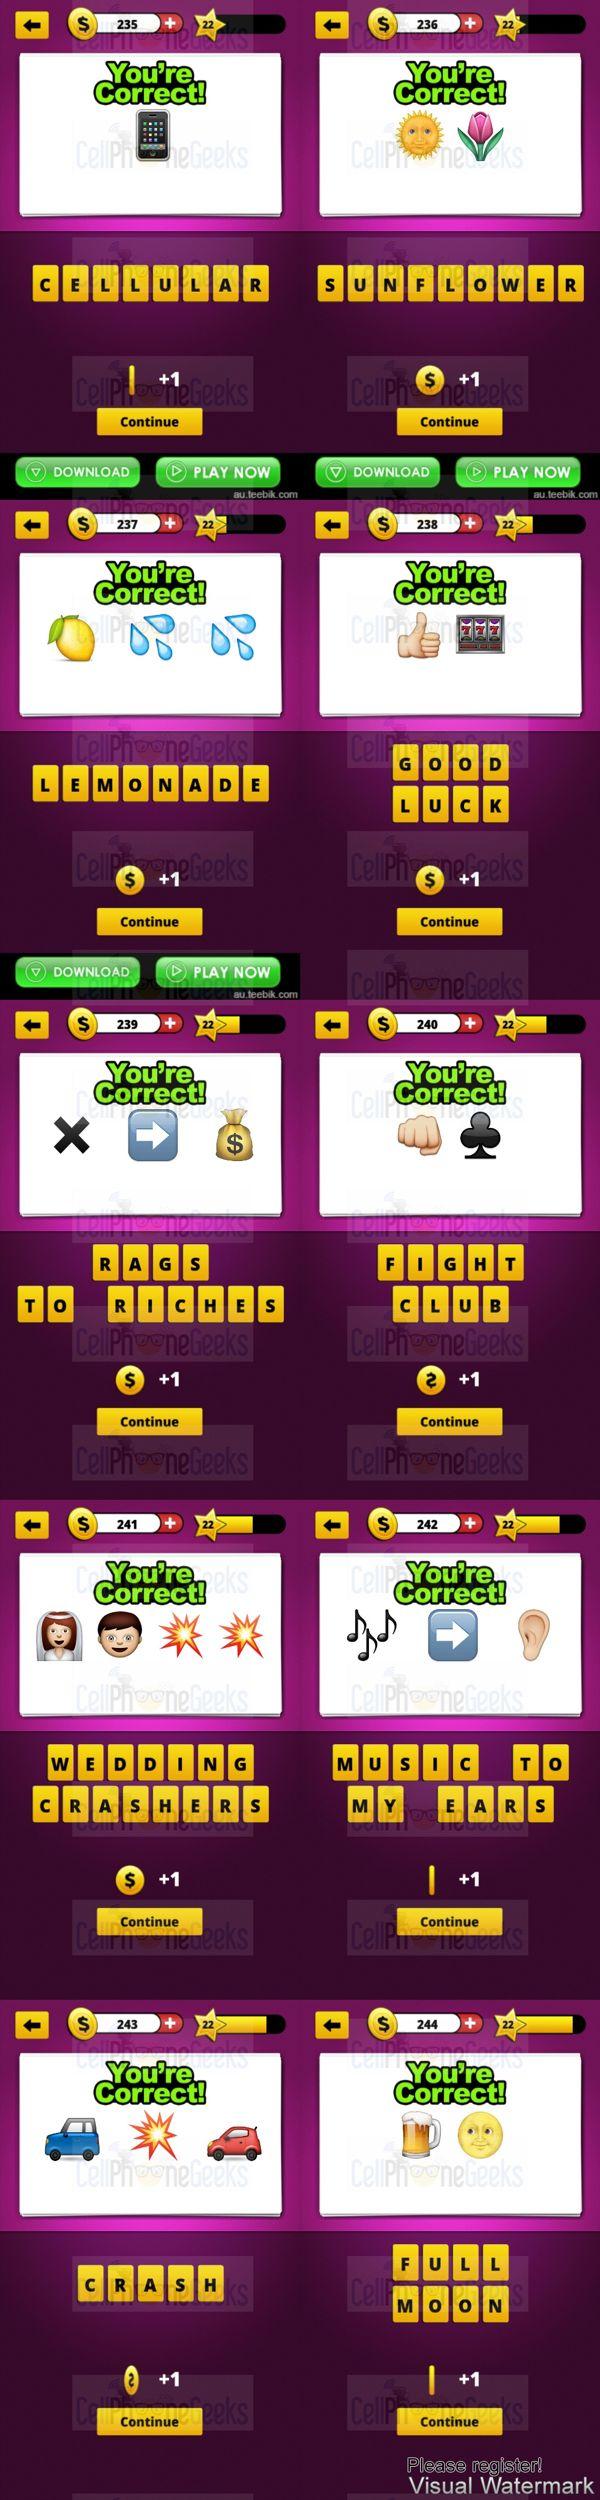 Guess The Emoji Answers Level 2 : guess, emoji, answers, level, Guess, Emoji, Level, Answers, CellPhoneGeeks, Answers,, Emoji,